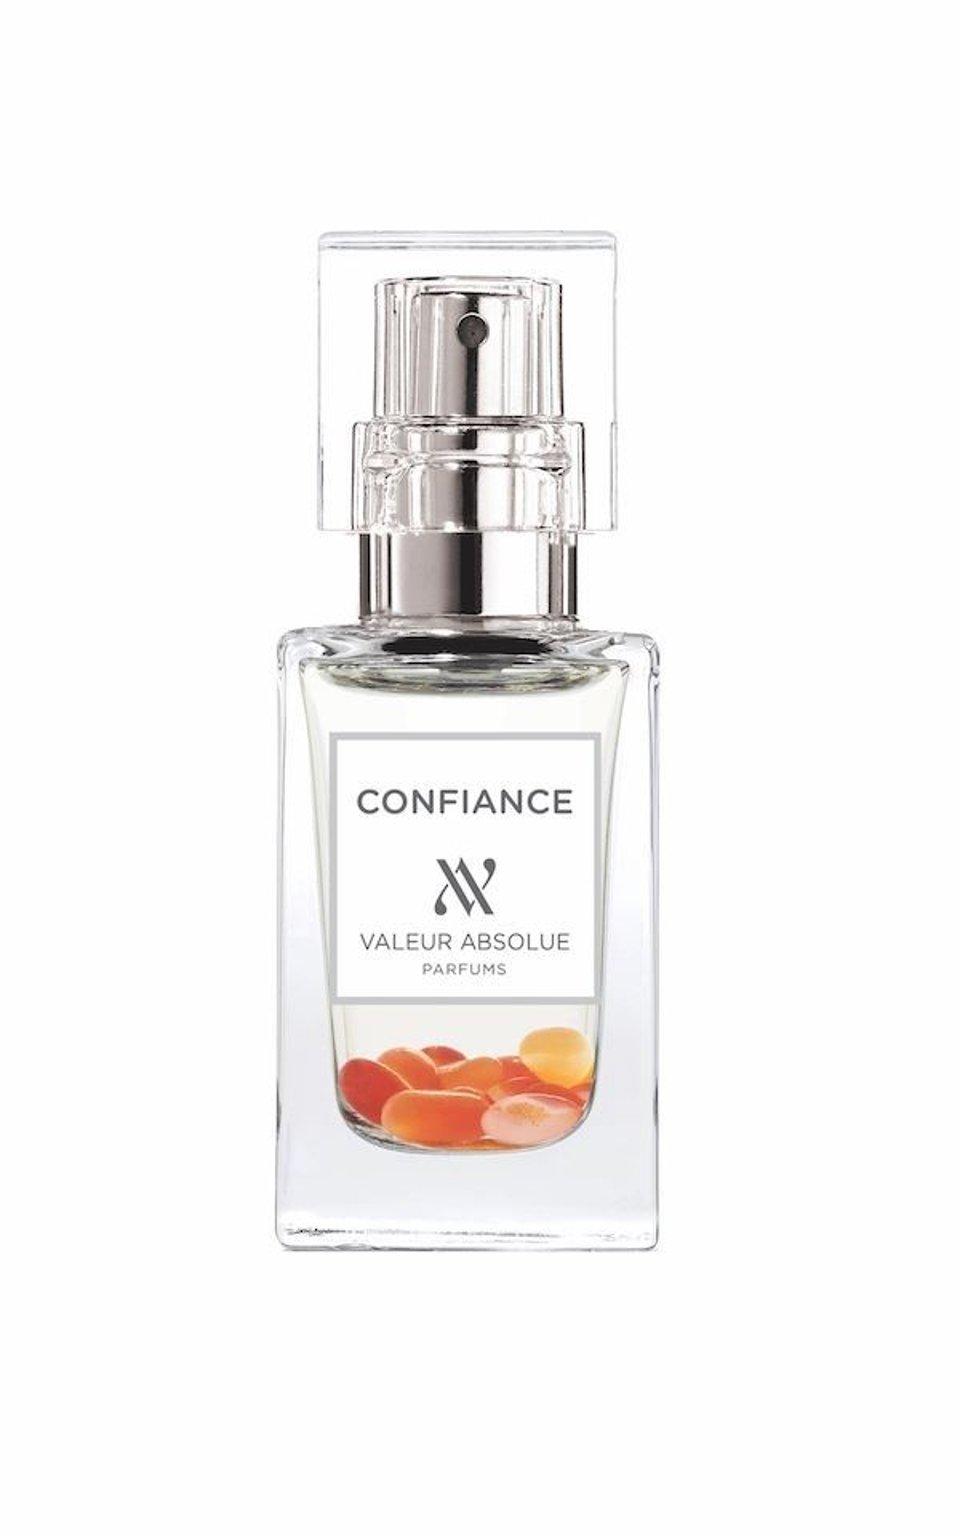 Perfume Confiance 14ml